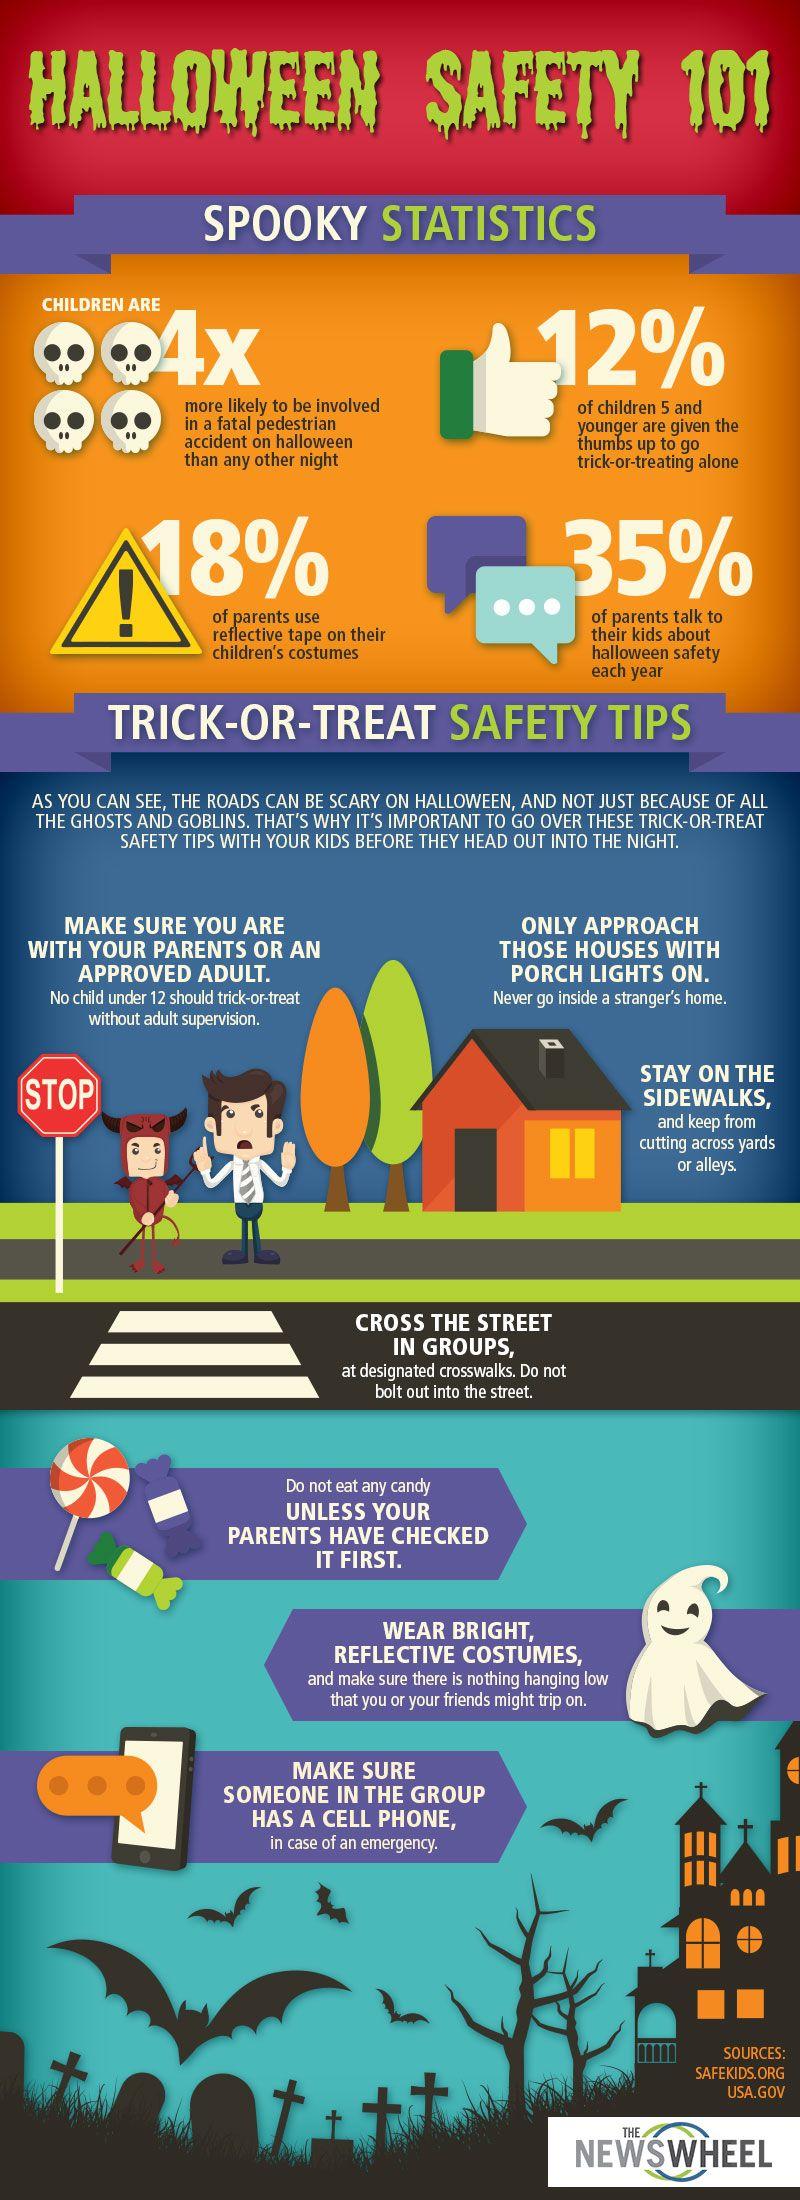 Child Safety Halloween Safety Tips Halloween safety